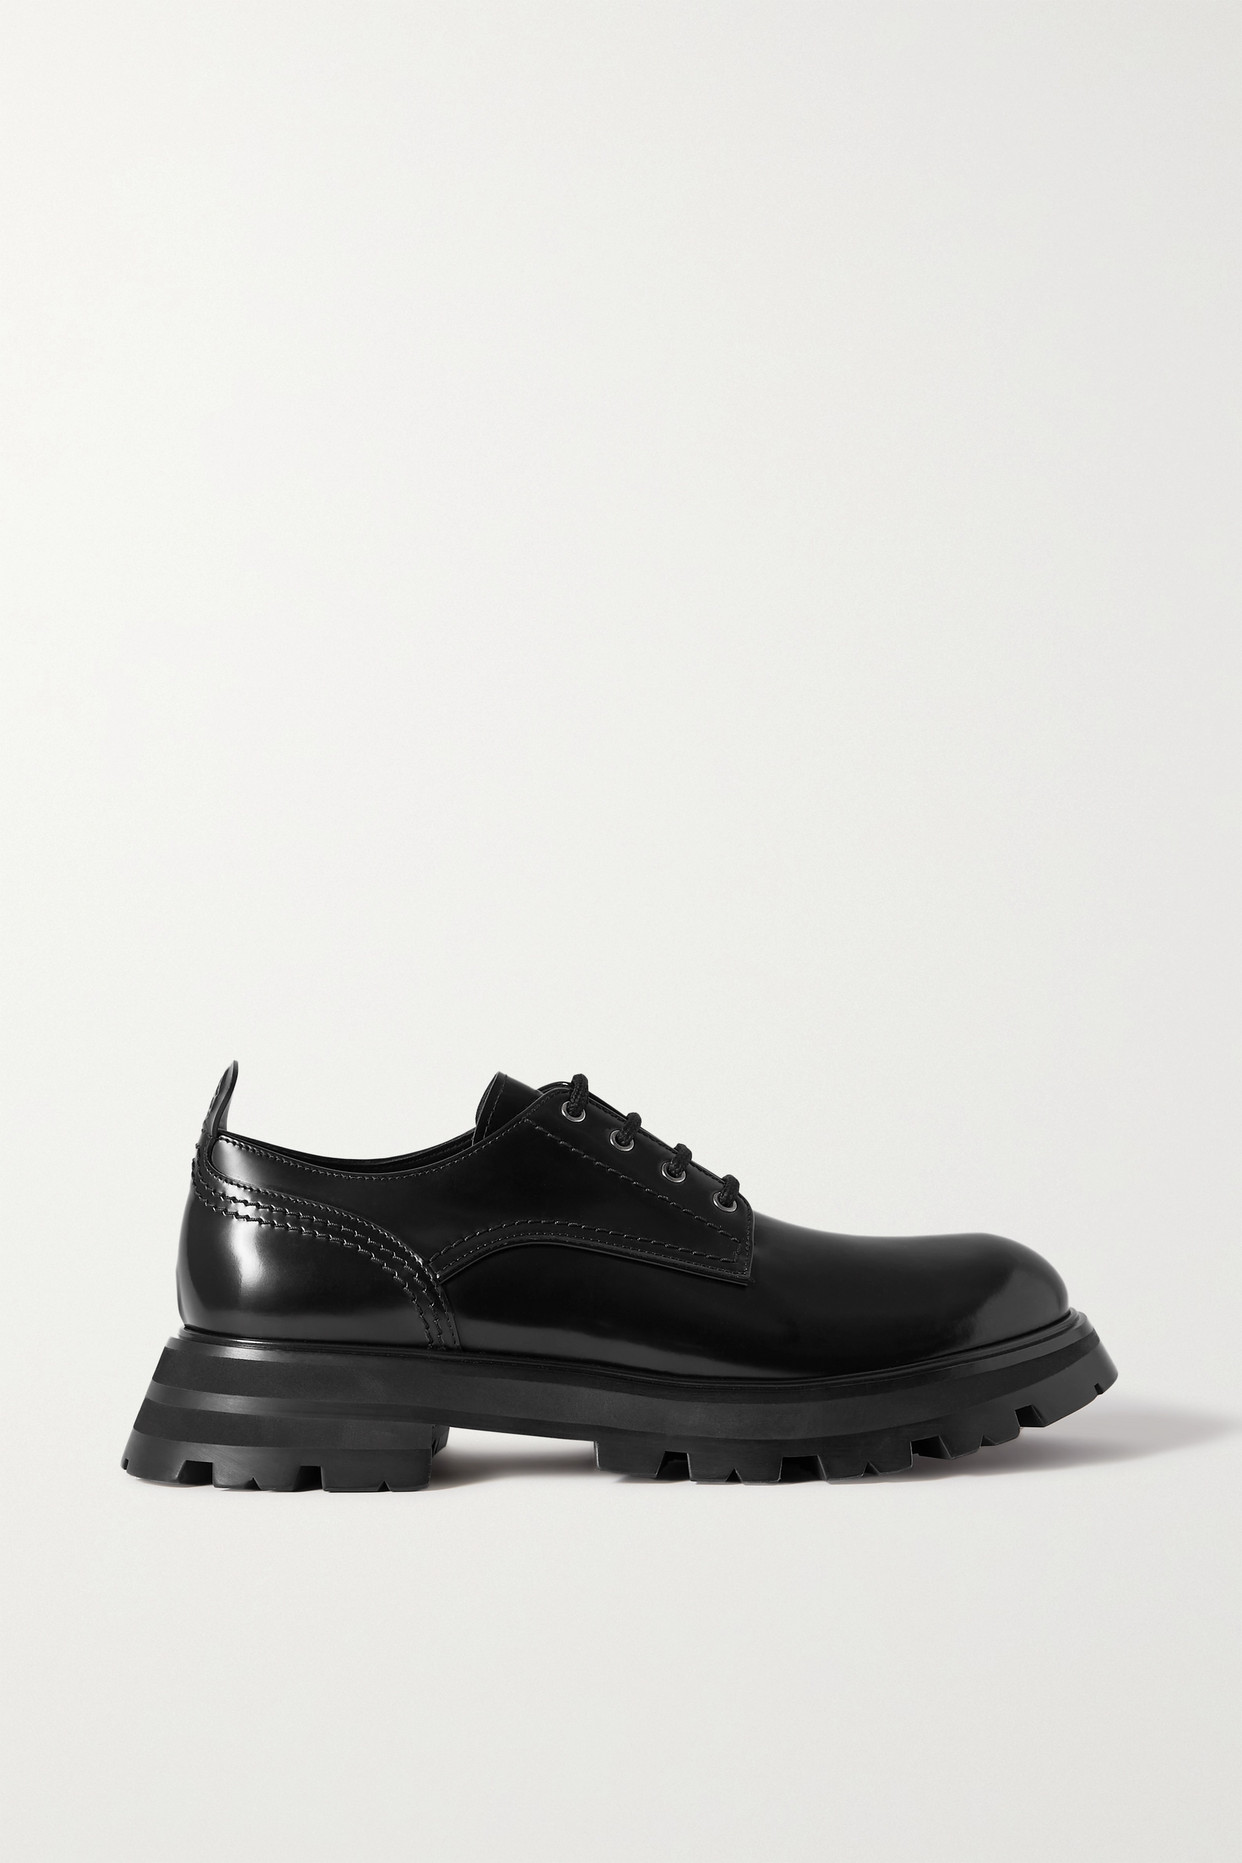 ALEXANDER MCQUEEN - 亮面皮革厚底布洛克鞋 - 黑色 - IT37.5